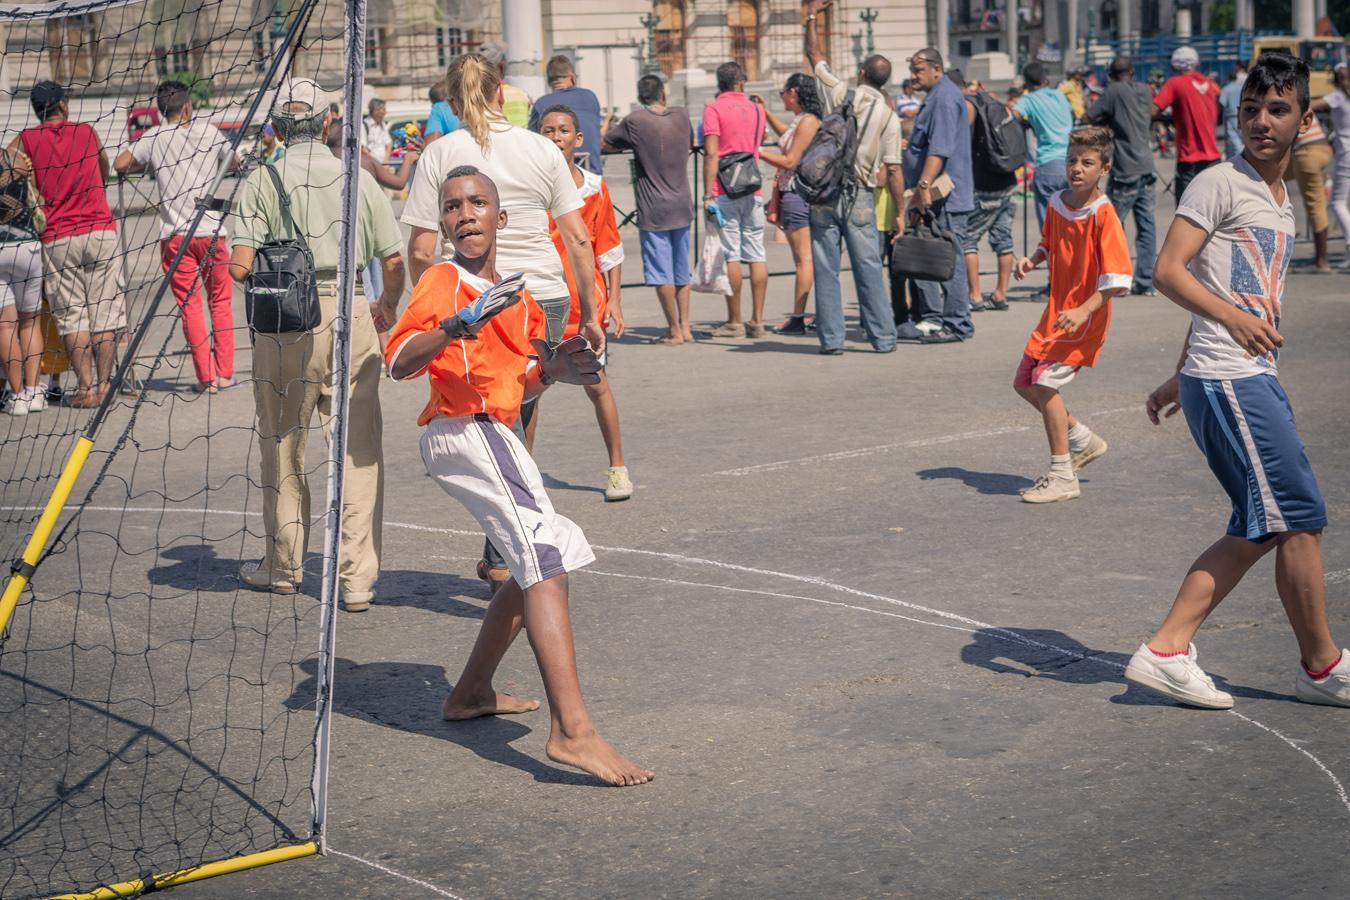 barefoot kid paying football in Havana